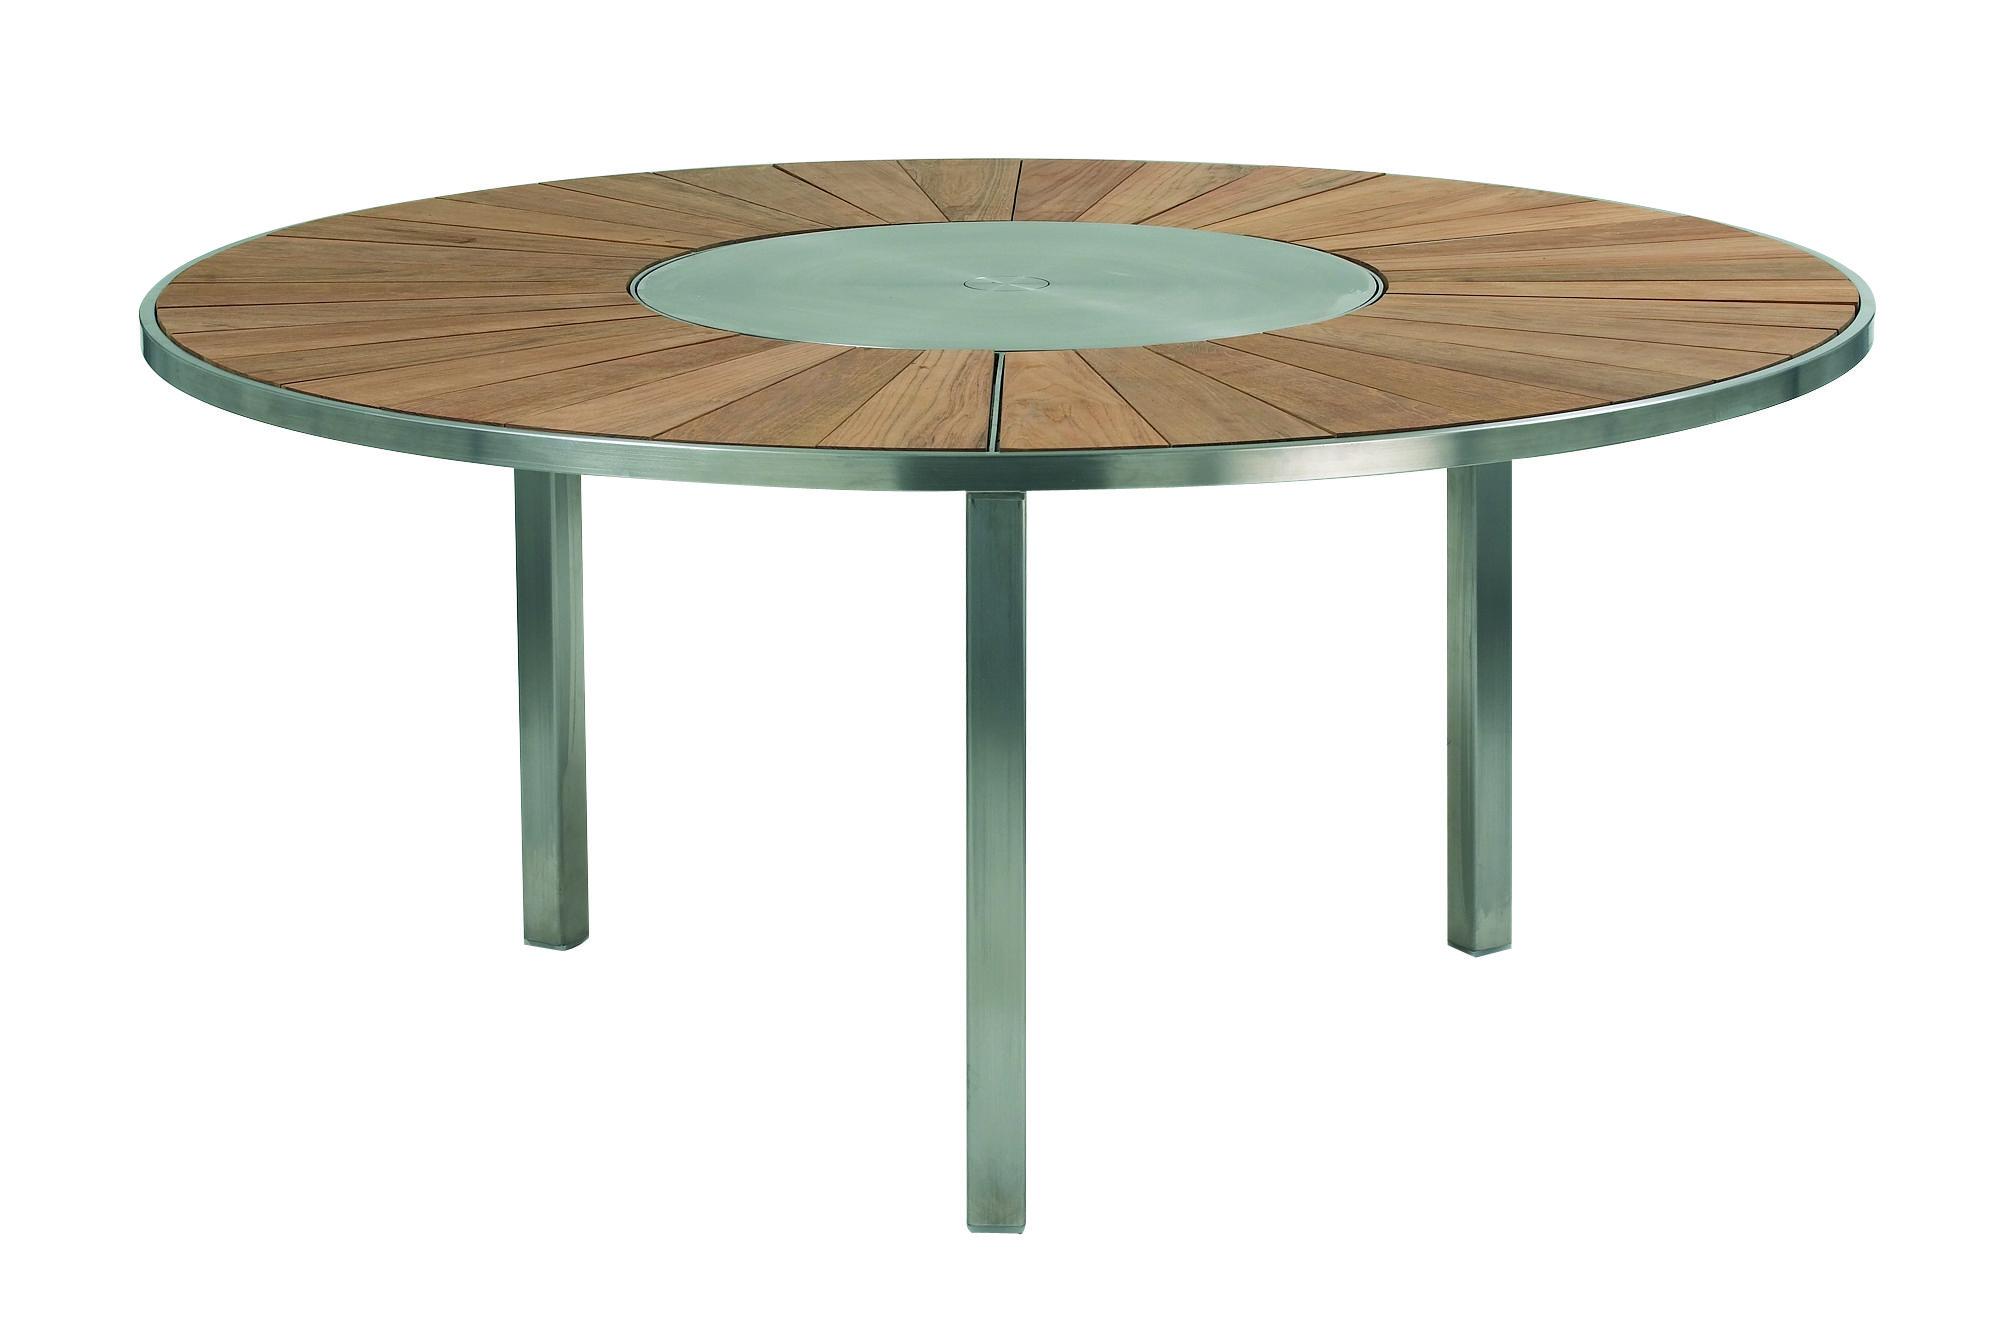 O Zon Table De Jardin By Royal Botania Design Kris Van Puyvelde